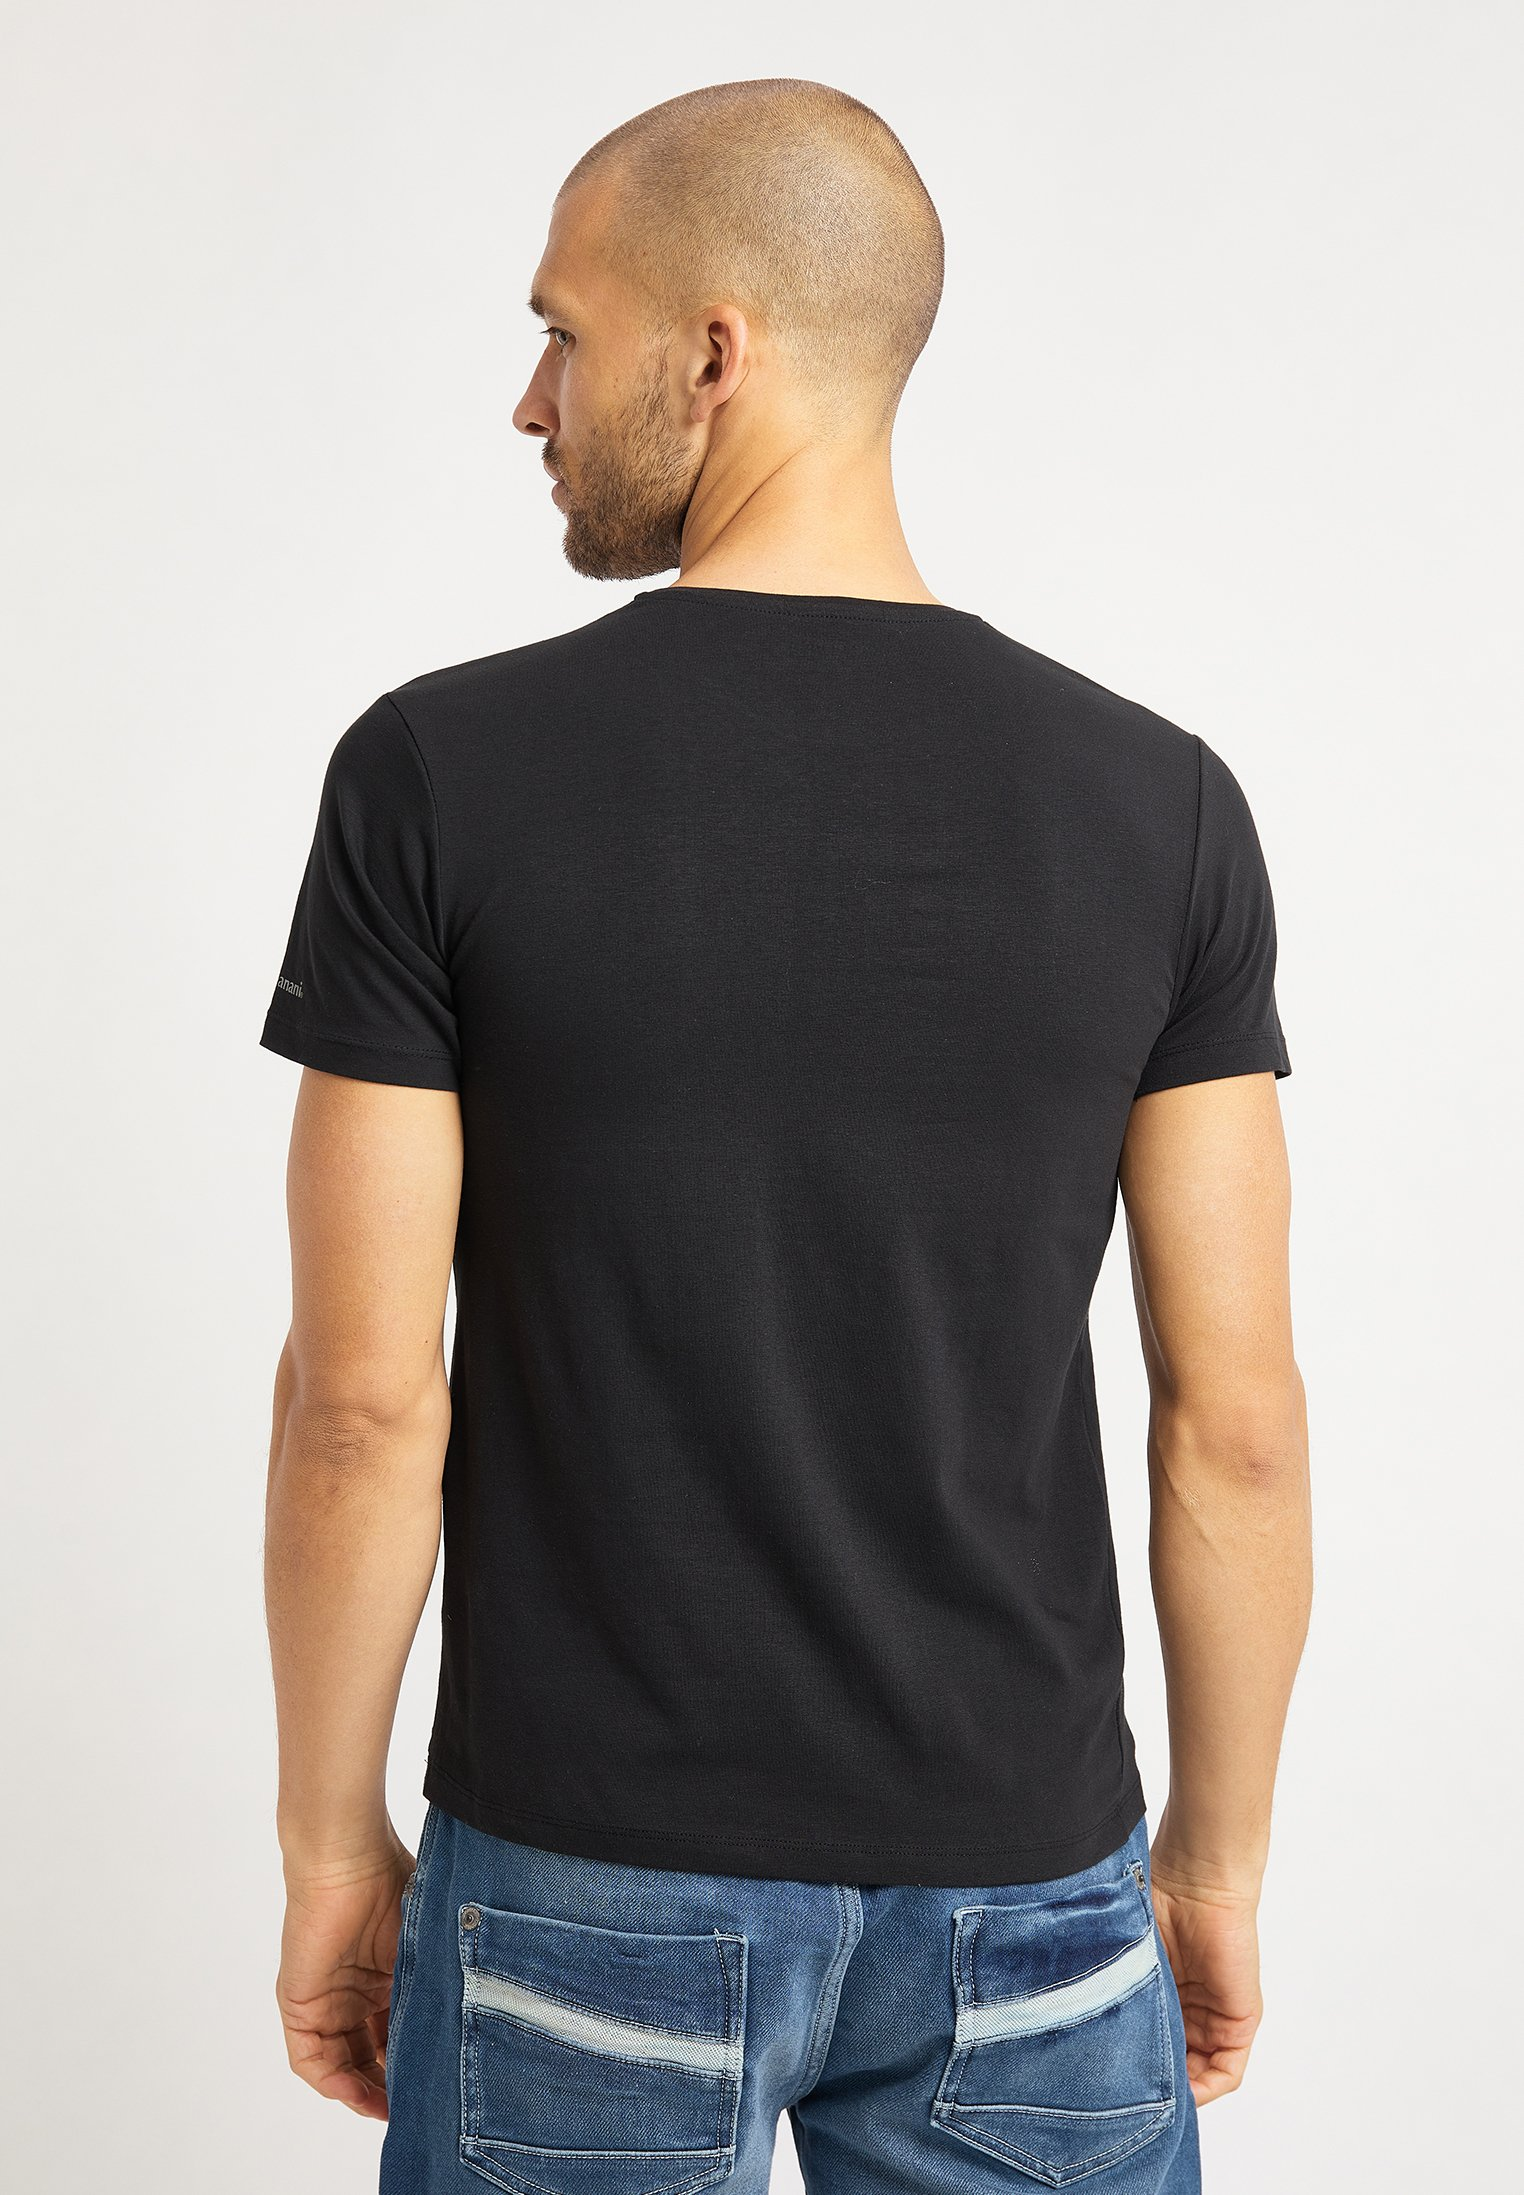 Bruno Banani T-shirt med print - schwarz - Herrkläder Rabatter